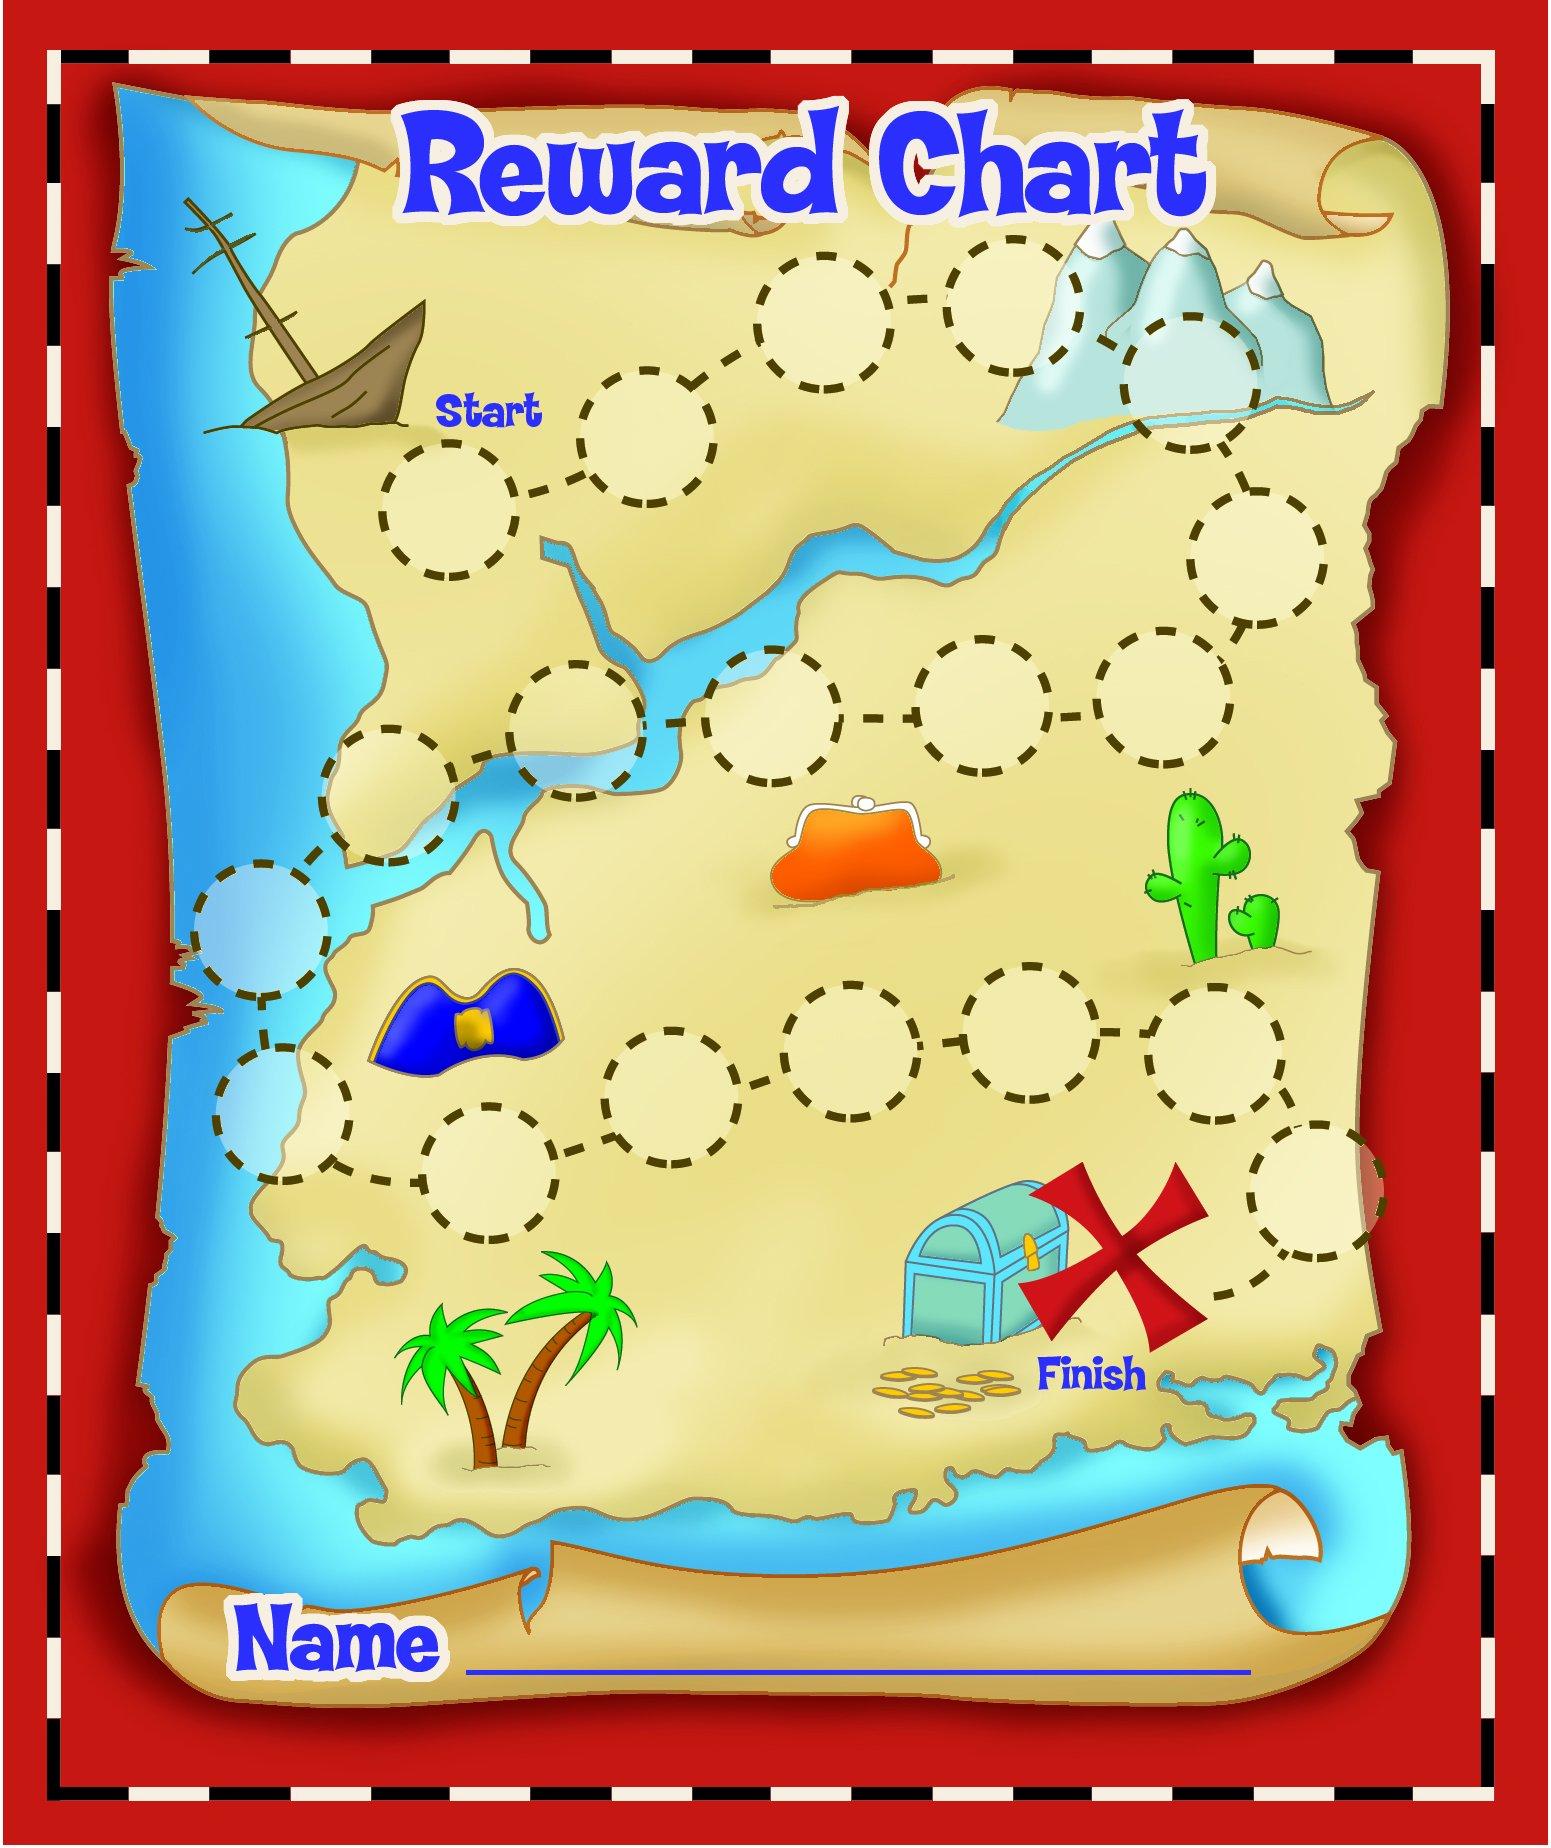 Eureka island Treasure Hunt Mini Reward Charts with Stickers, Package of 36